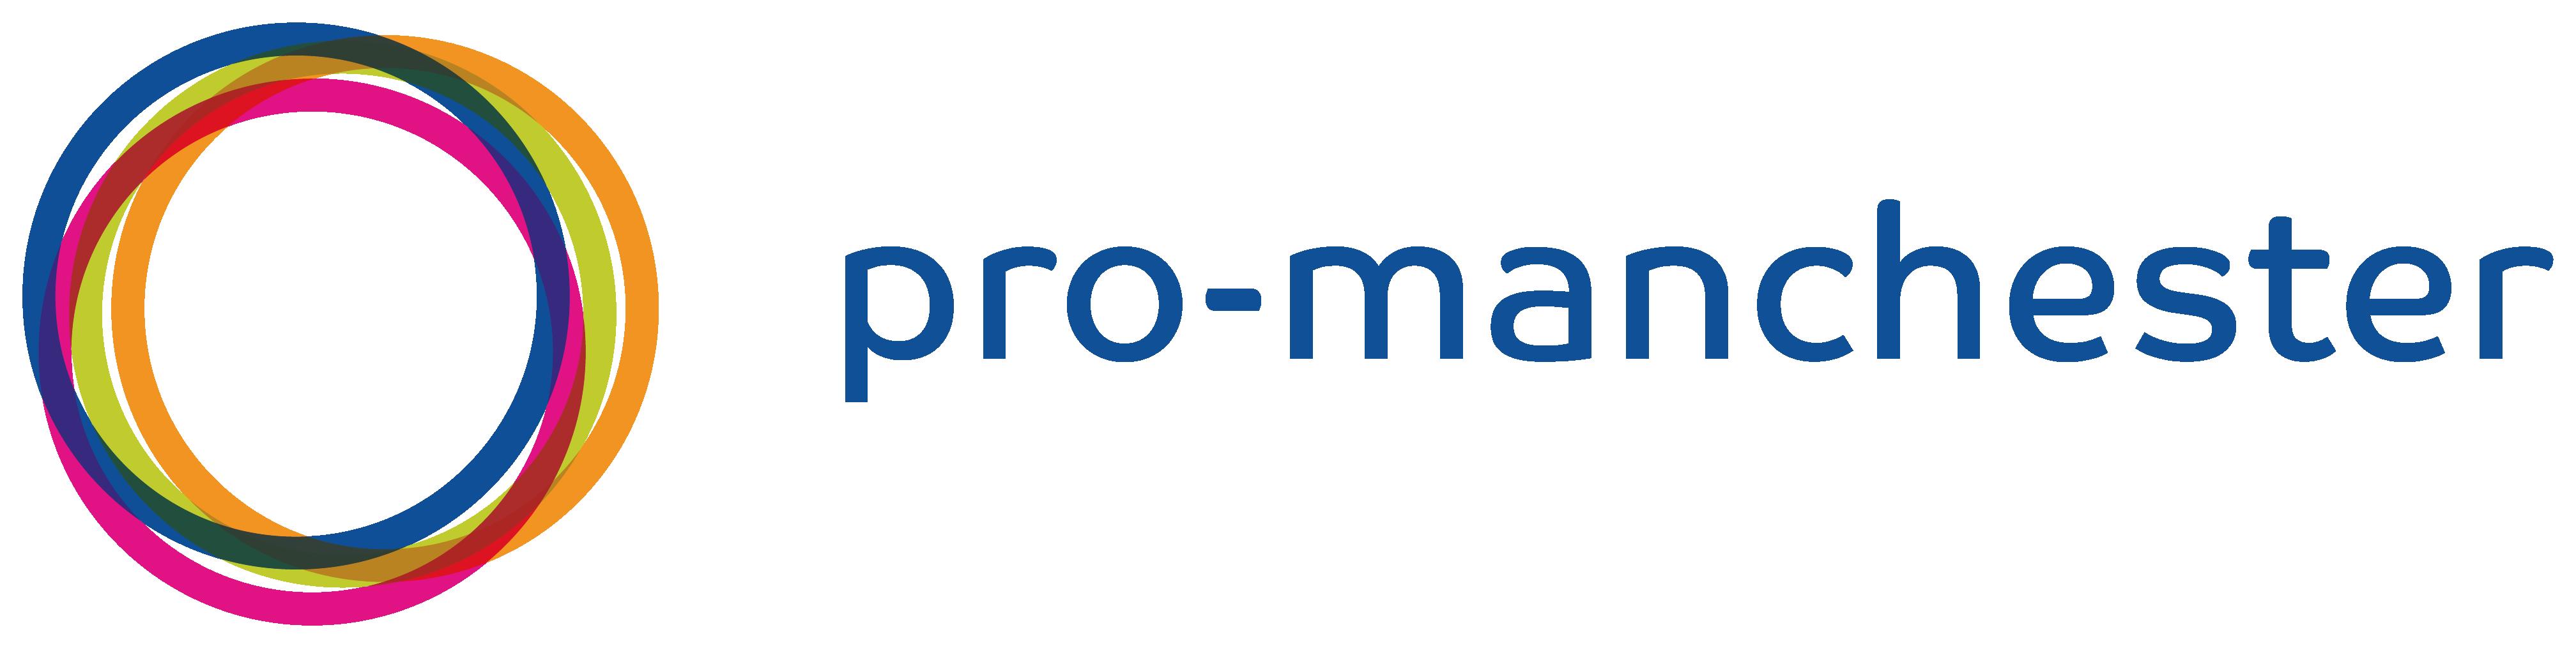 https://www.pro-manchester.co.uk/wp-content/uploads/2018/09/Pro-manchester_Logo-1.png